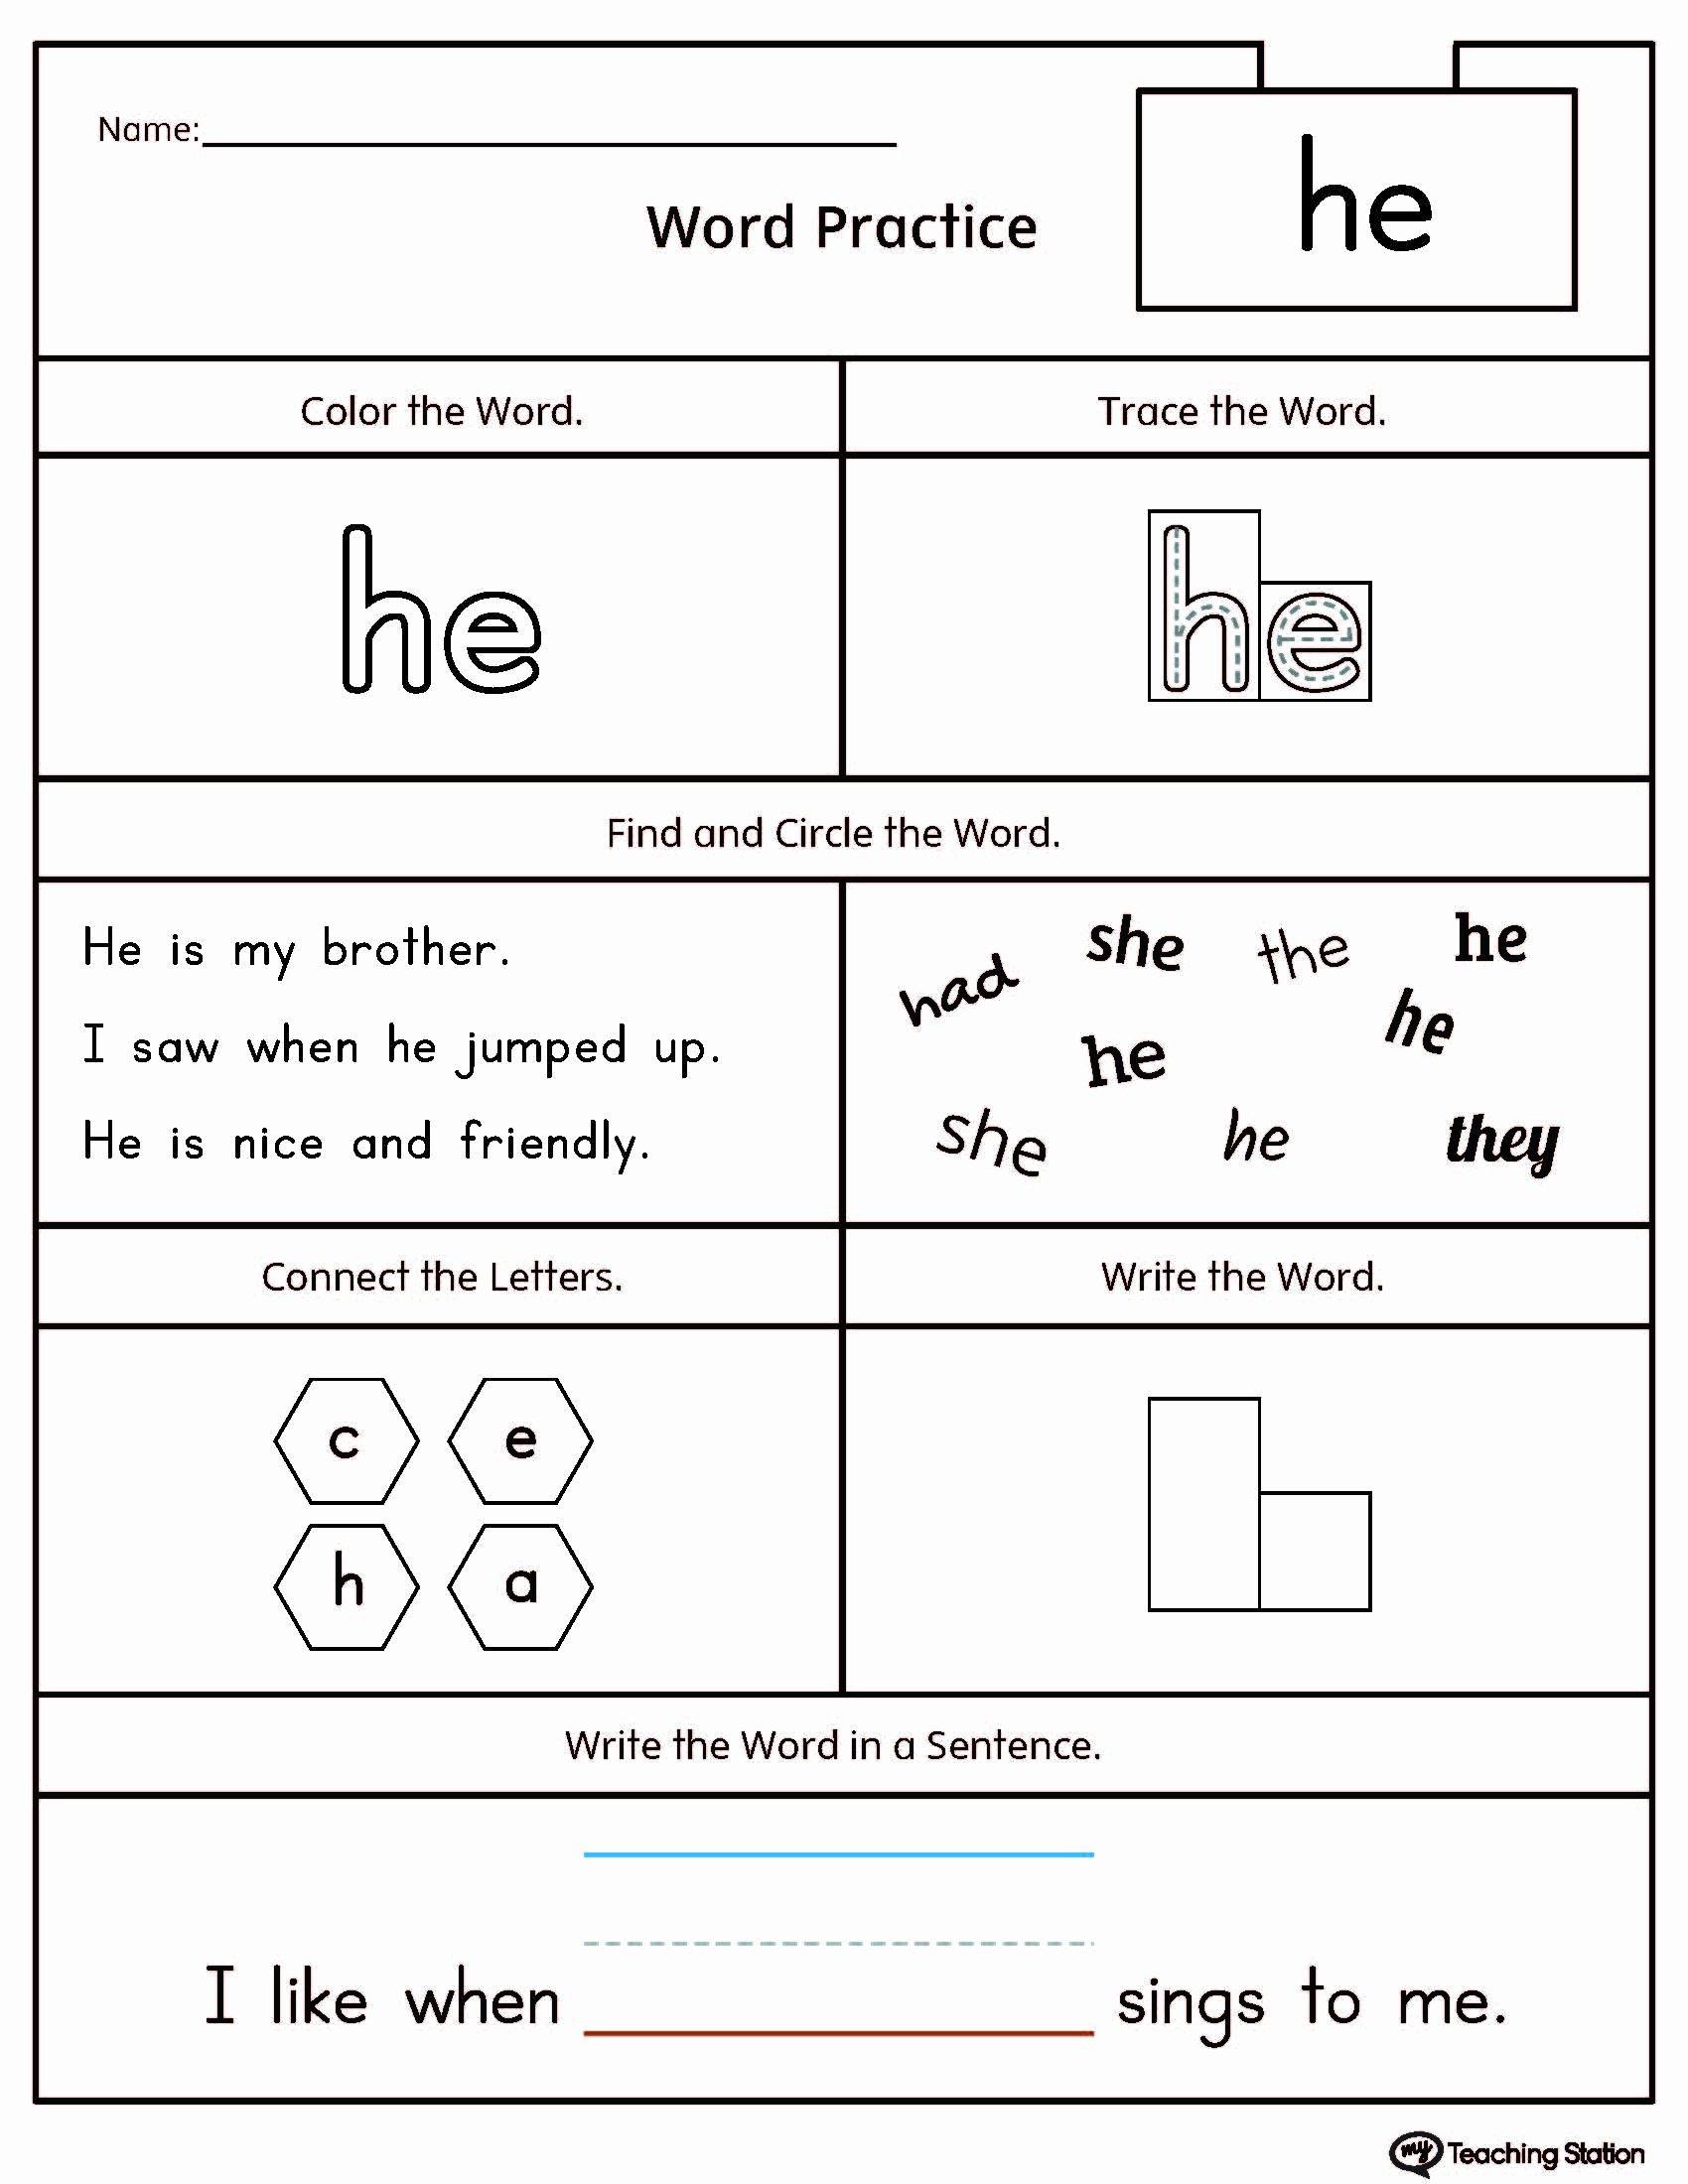 Sight Words Worksheets for Preschoolers top High Frequency Word He Printable Worksheet